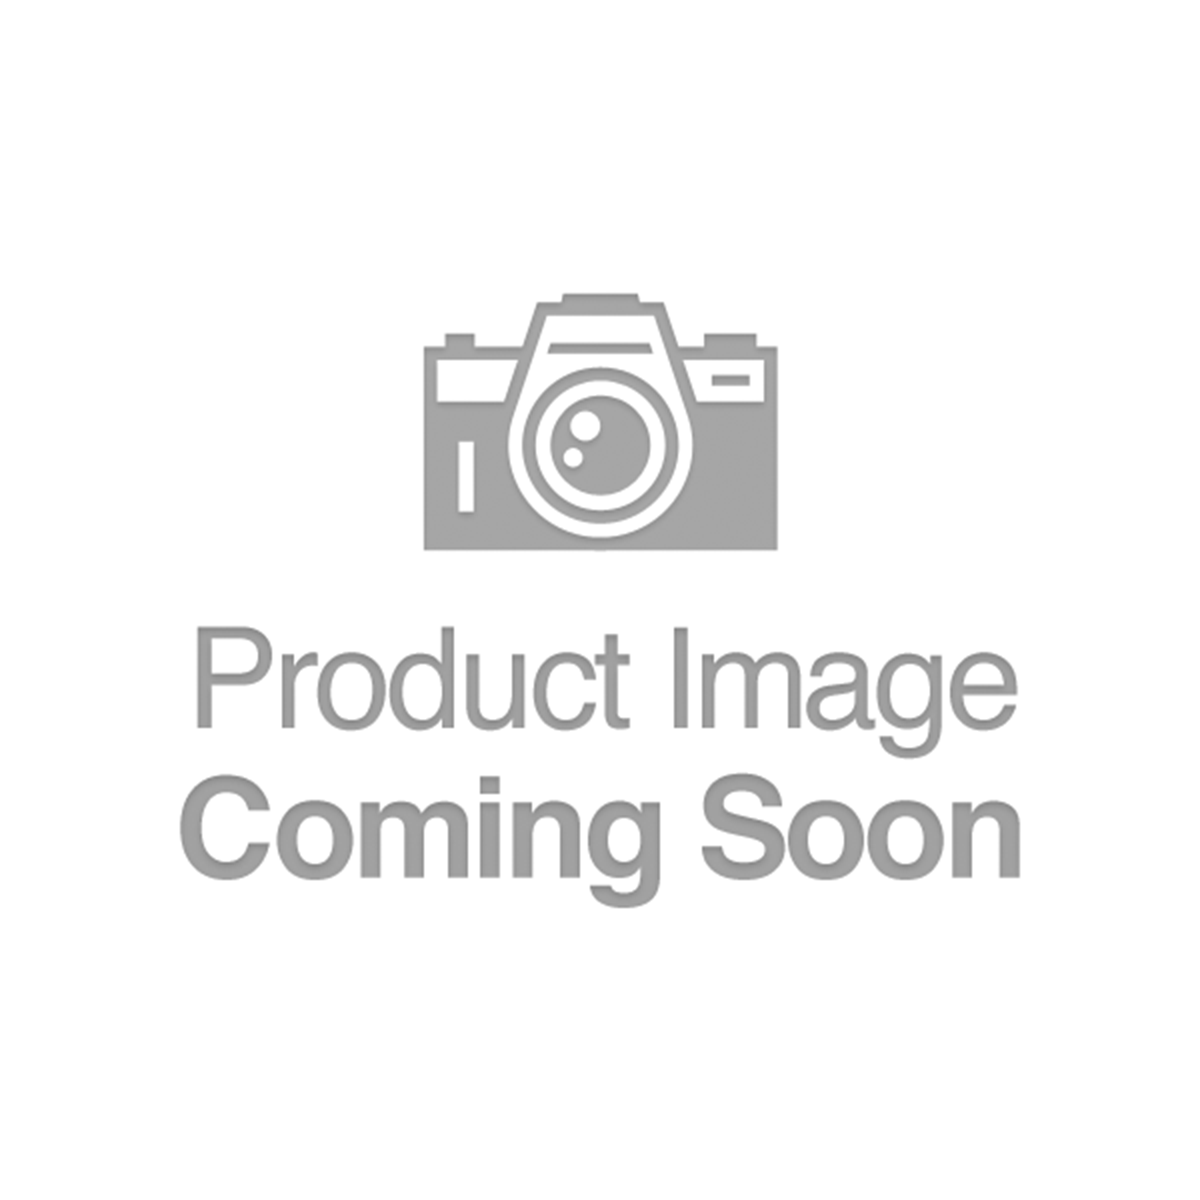 Covington - Virginia - CH 4503 - FR 627 - VF